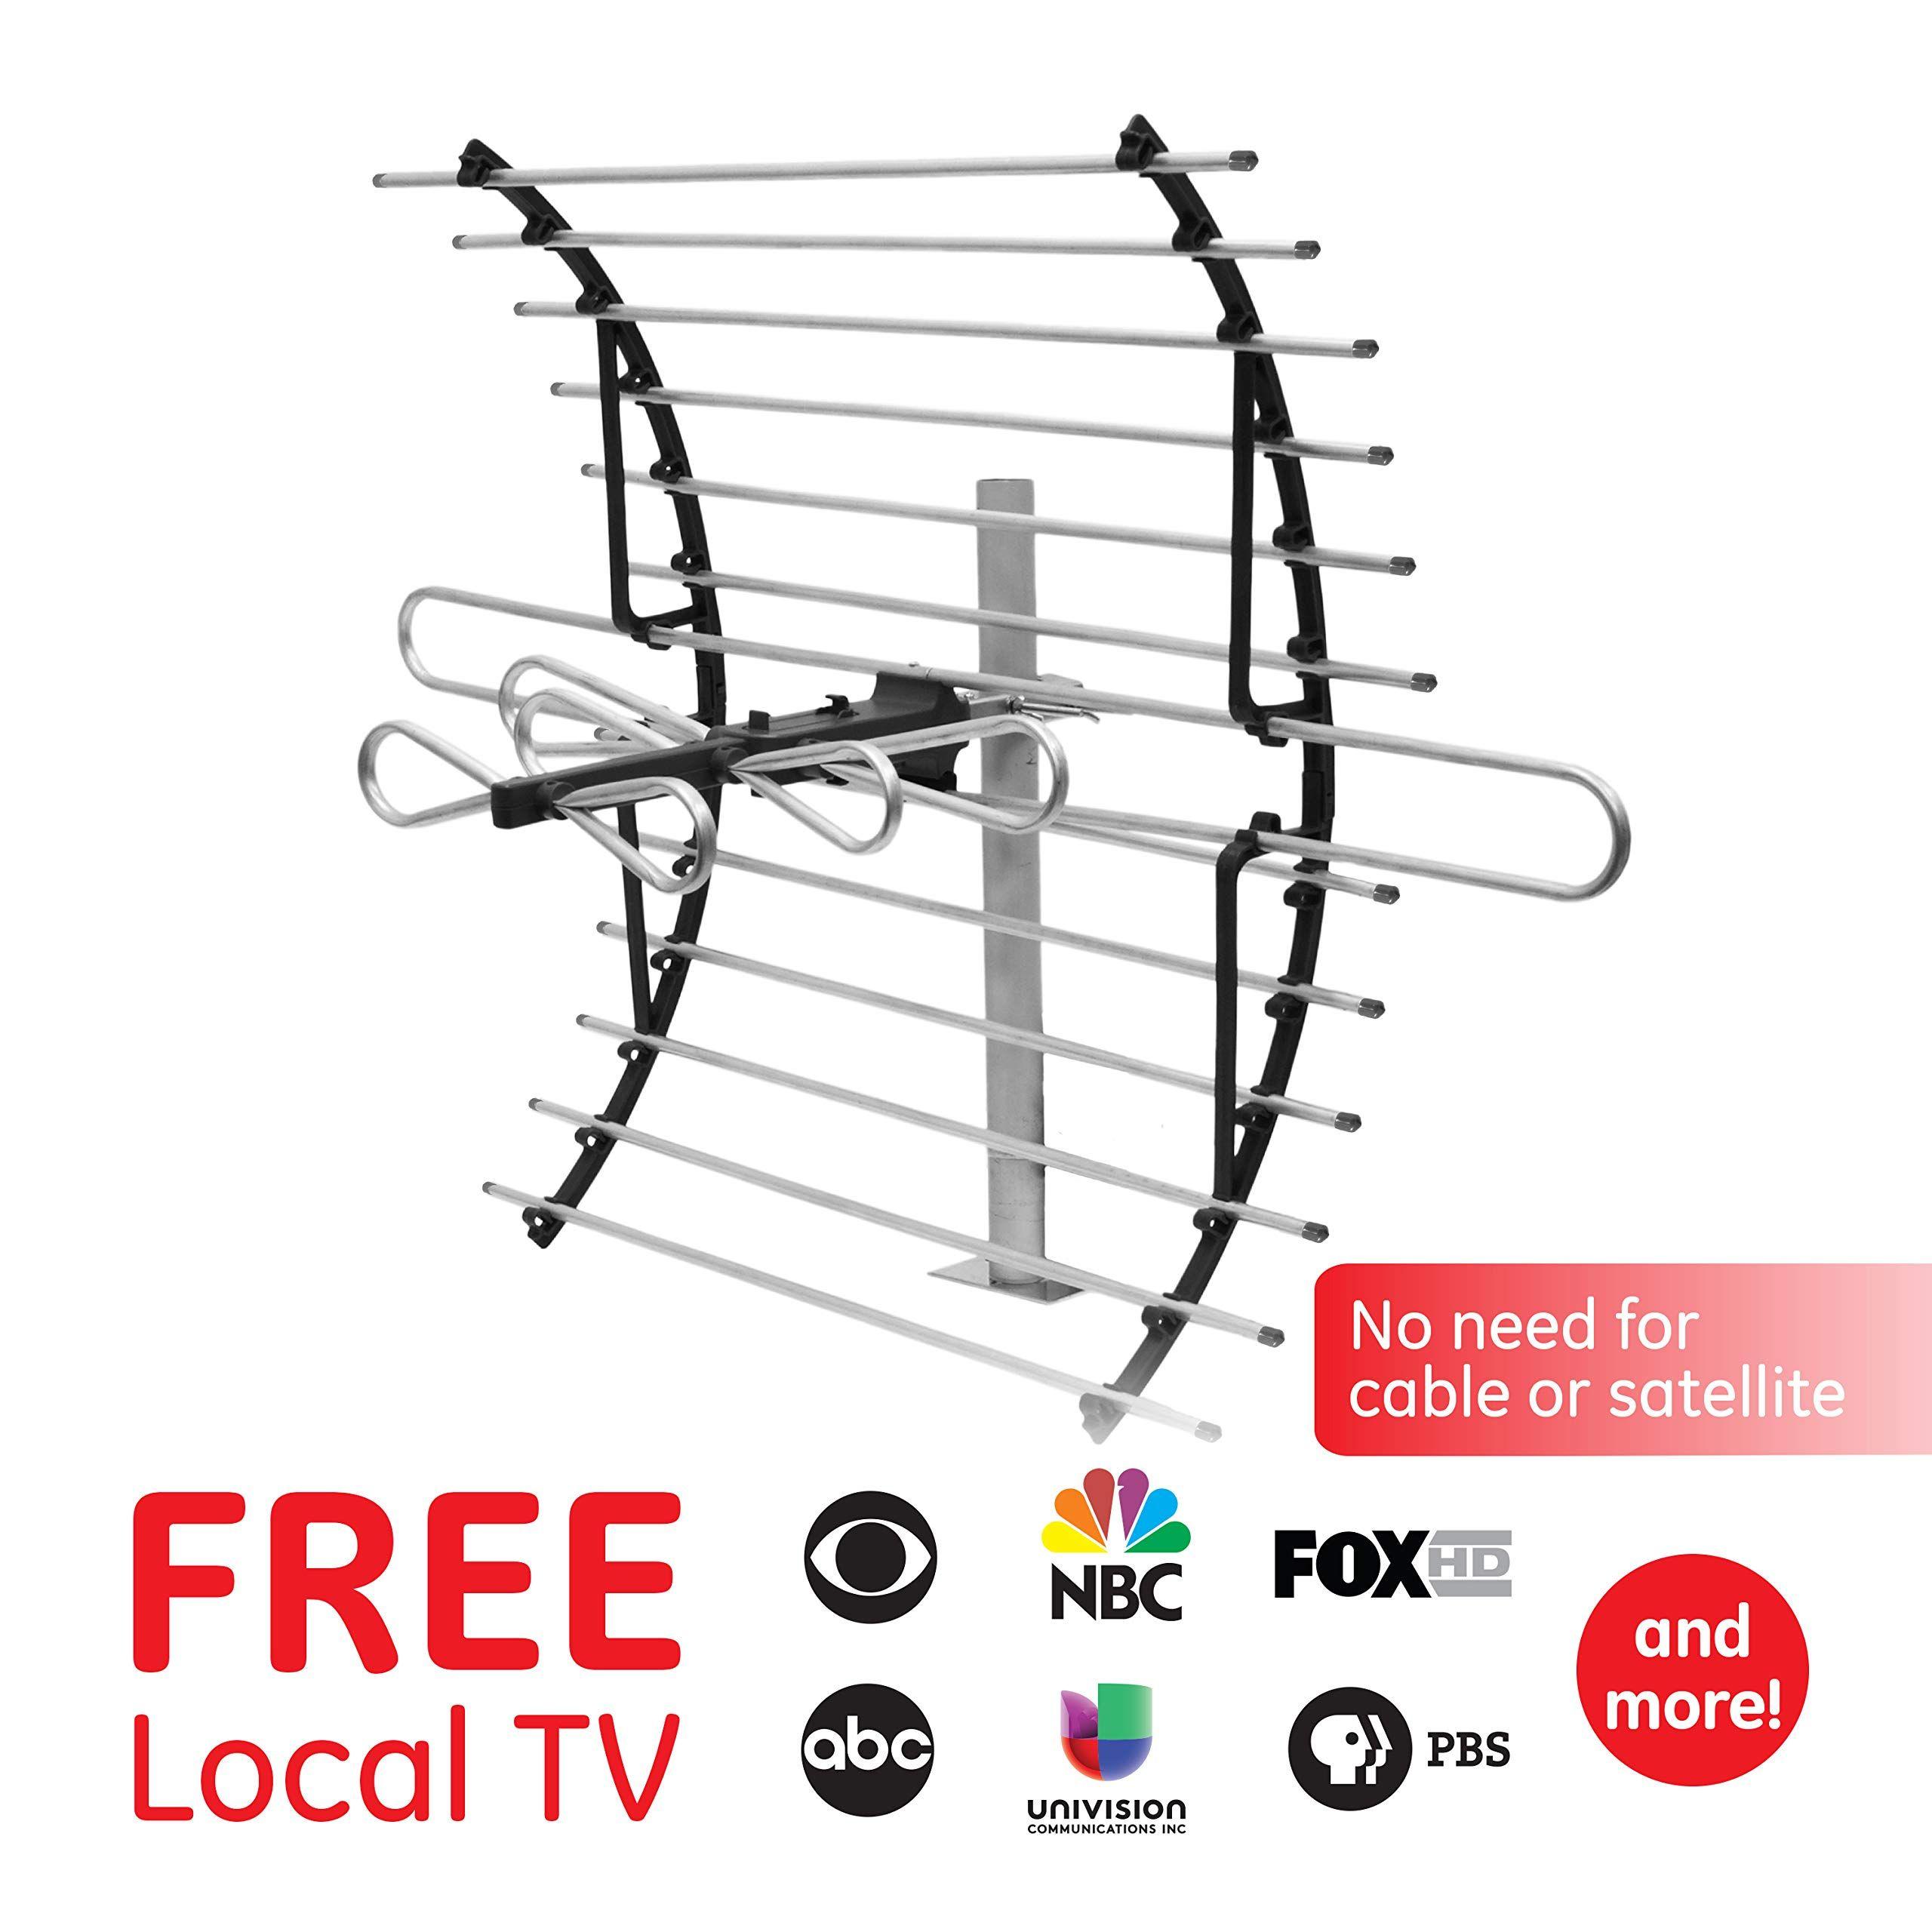 Ge Pro Attic Mount Tv Antenna Attic Long Range Antenna Directional Antenna Digital Hdtv Antenna 4k 1080p Vhf Uhf Compact Antenna Tv Antenna Hdtv Antenna